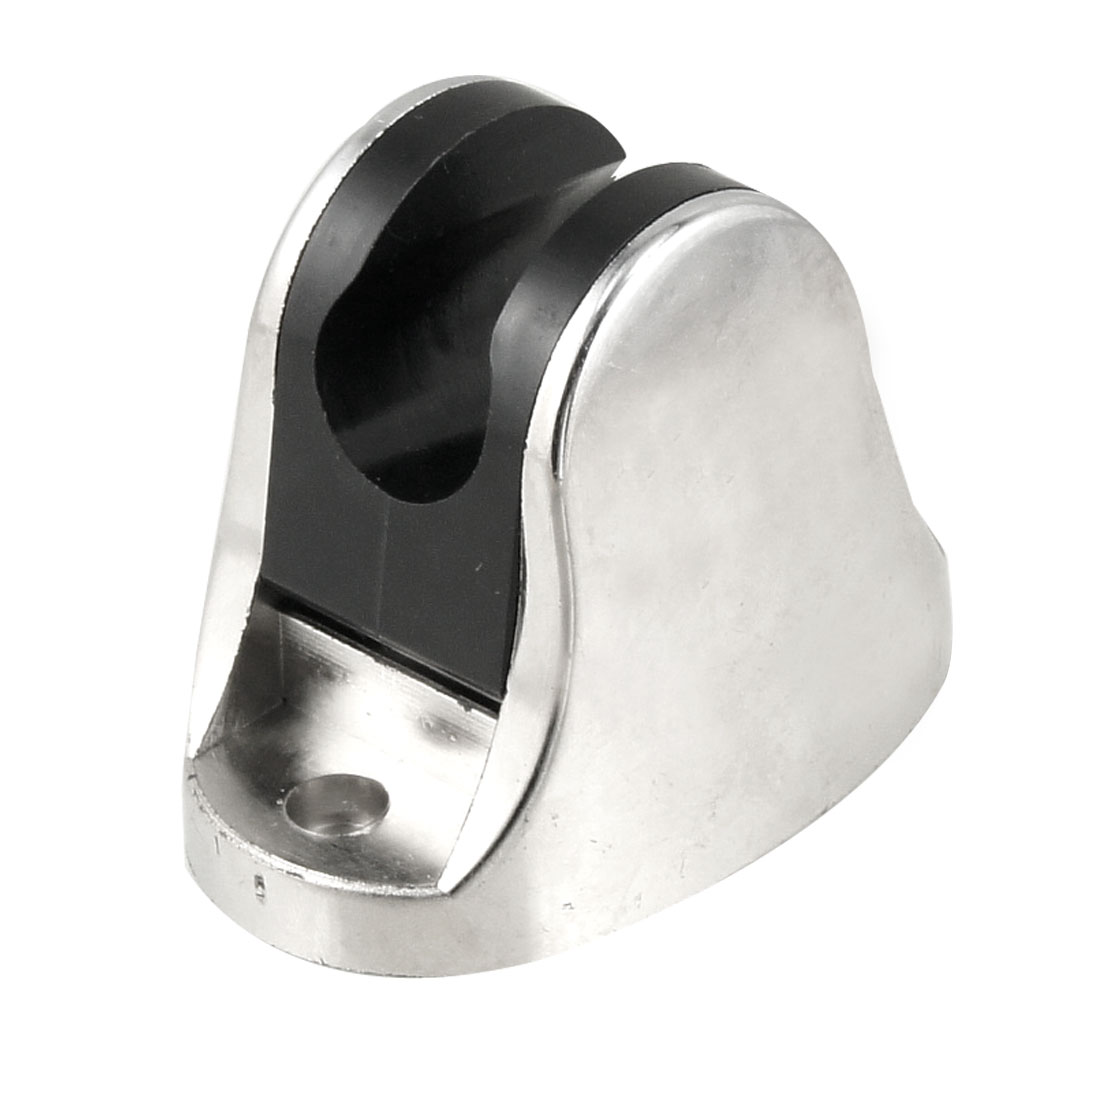 Silver Tone Black Plastic Bathroom Head Holder Bracket w 2 Screw Holes